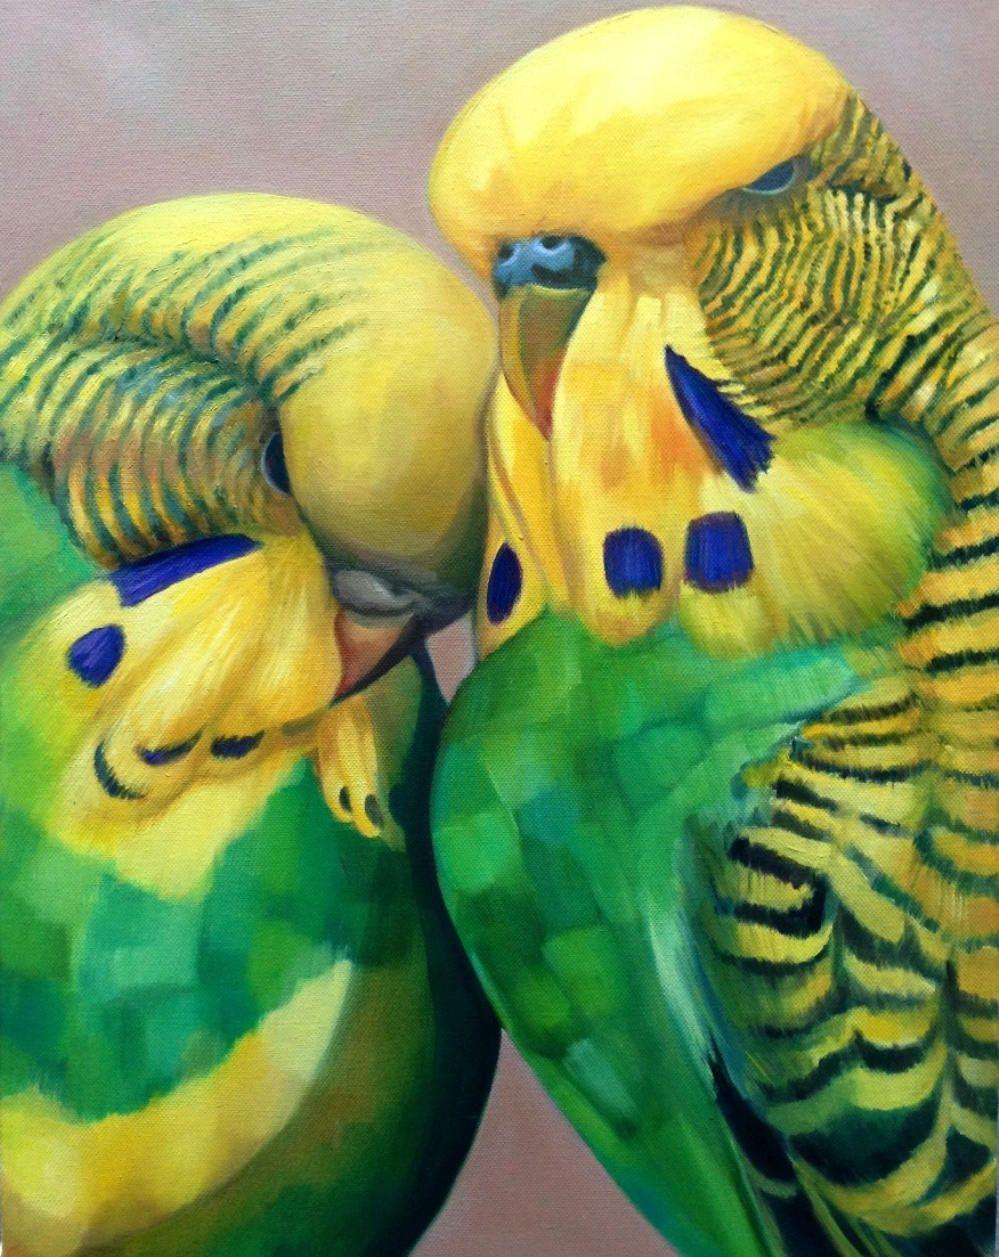 Budgie parakeetgreeting card art decopair green fine art de budgie greeting card art deco pair green budgerigar parakeet fine art in de lempicka style original kristyandbryce Image collections